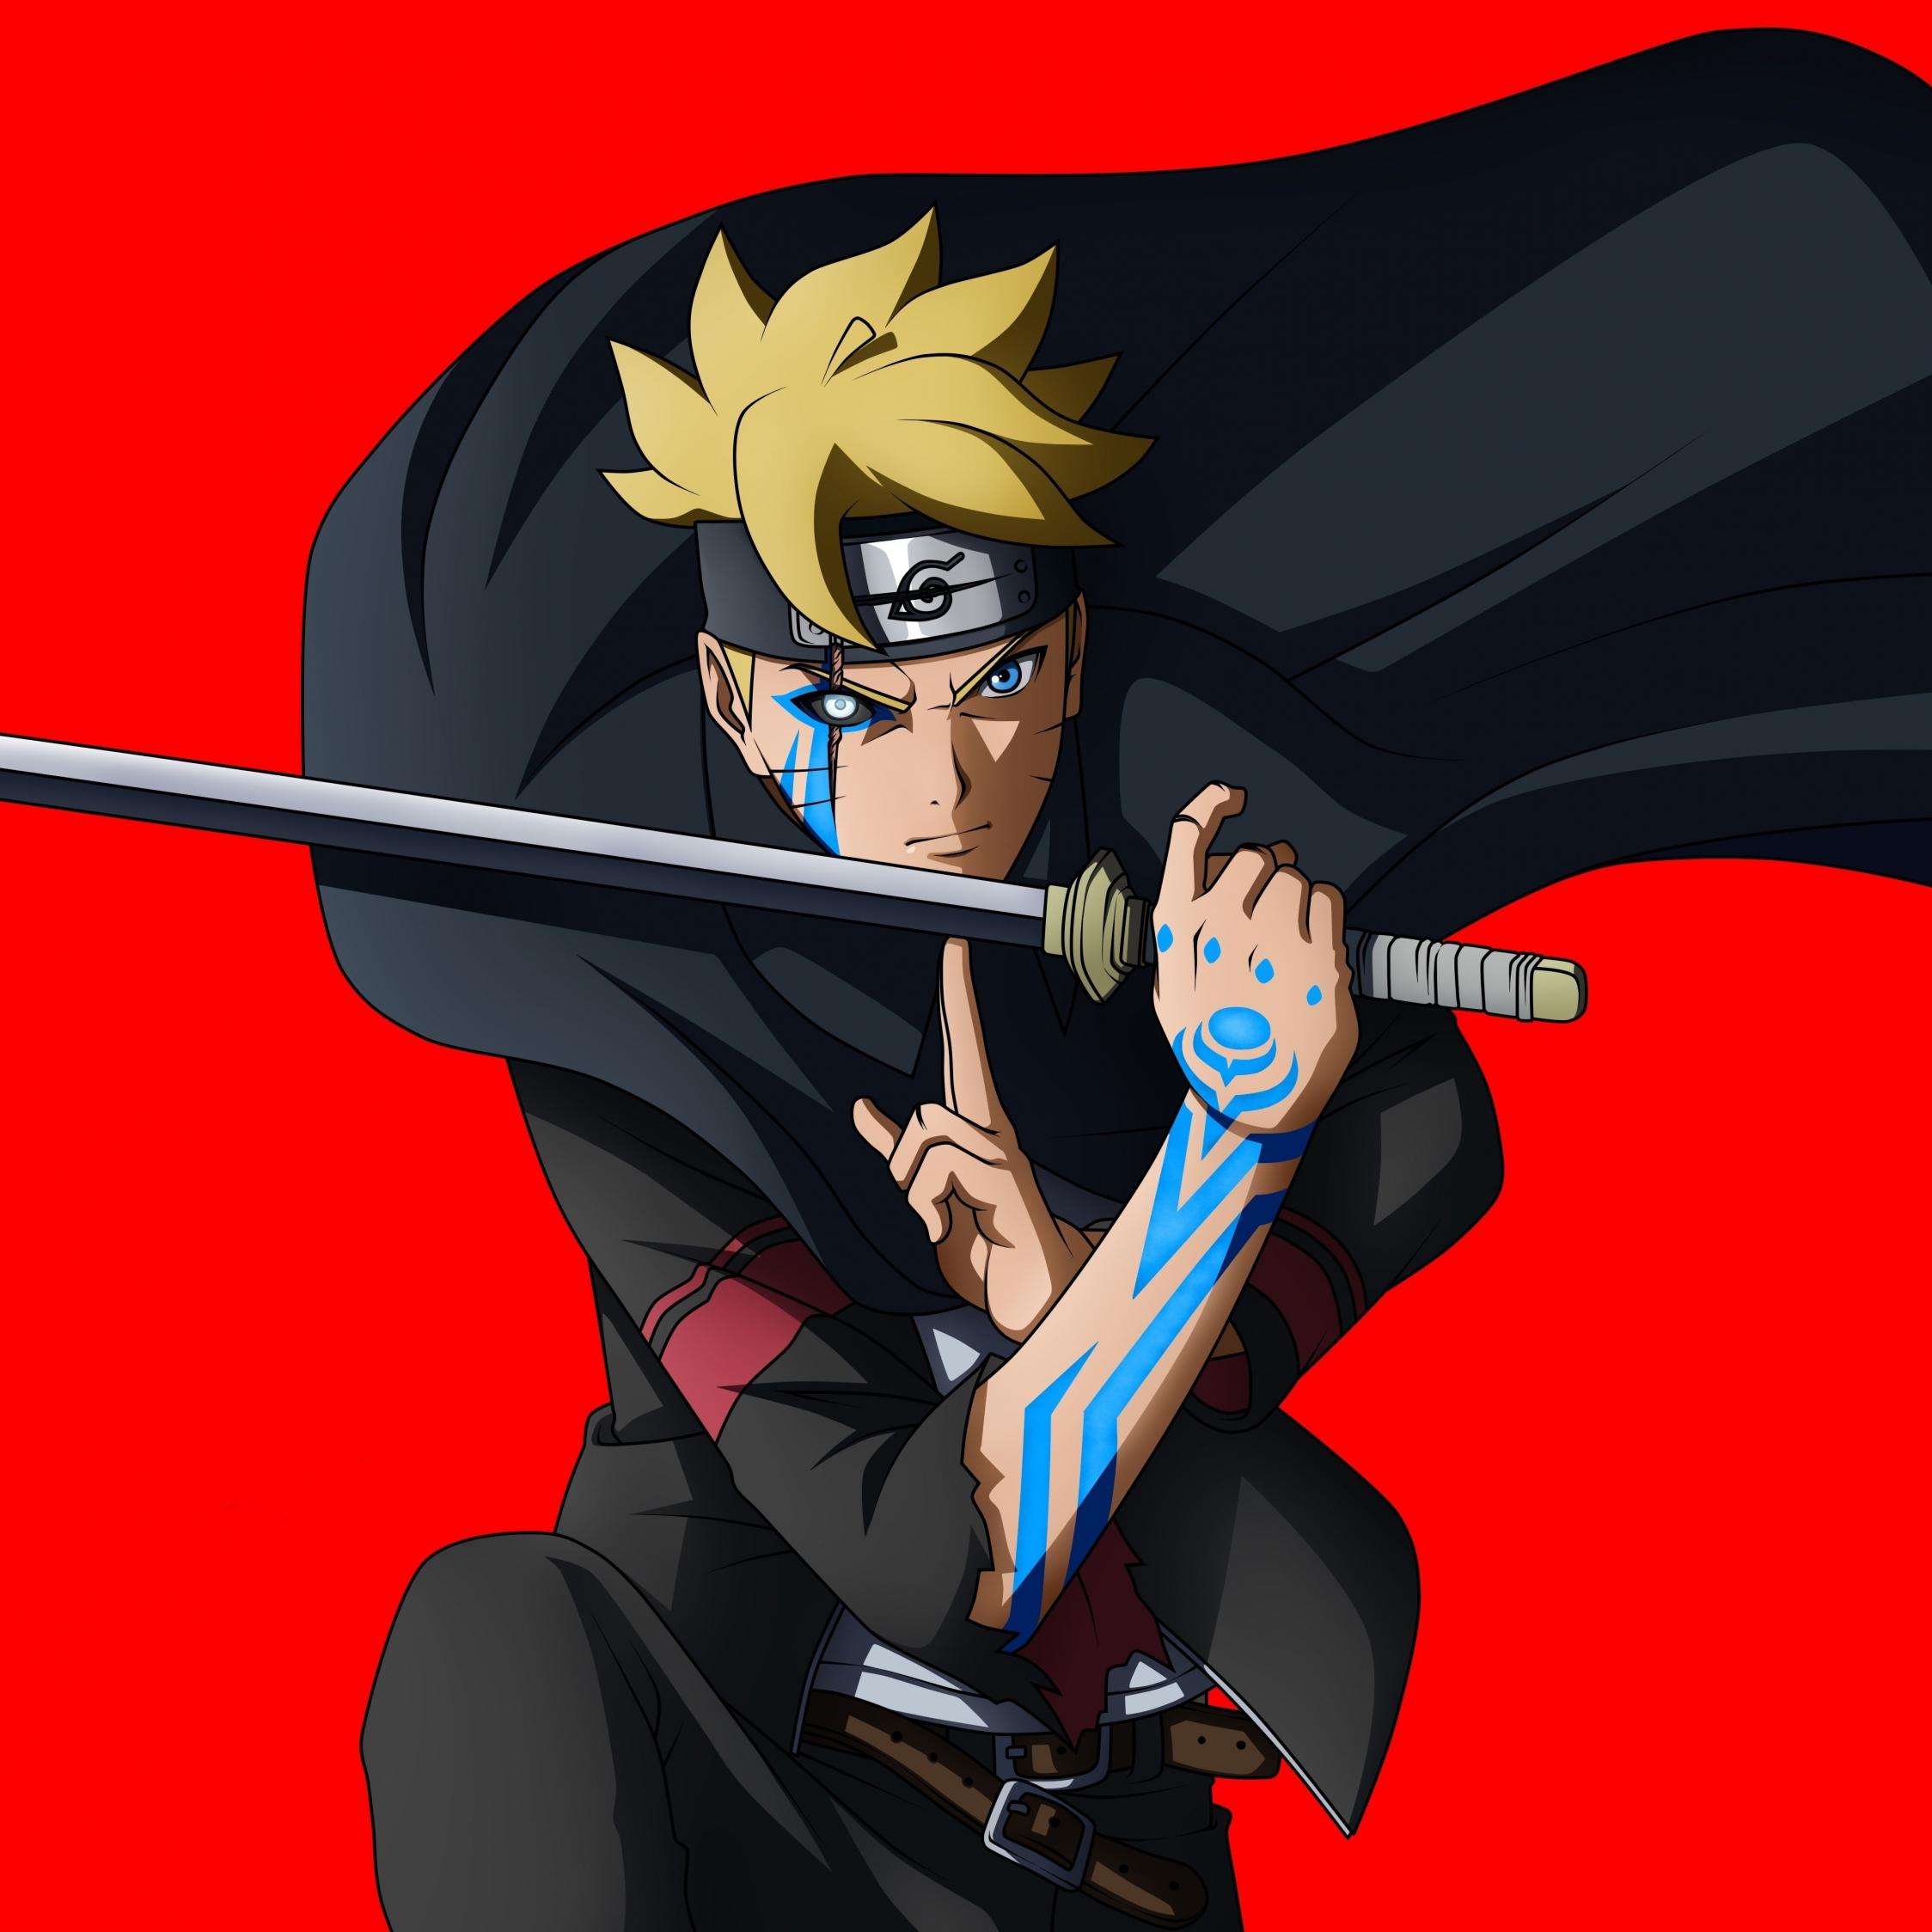 Cool Wallpaper Naruto Ipad Air - boruto-anime-naruto-4k  HD_152780.jpg